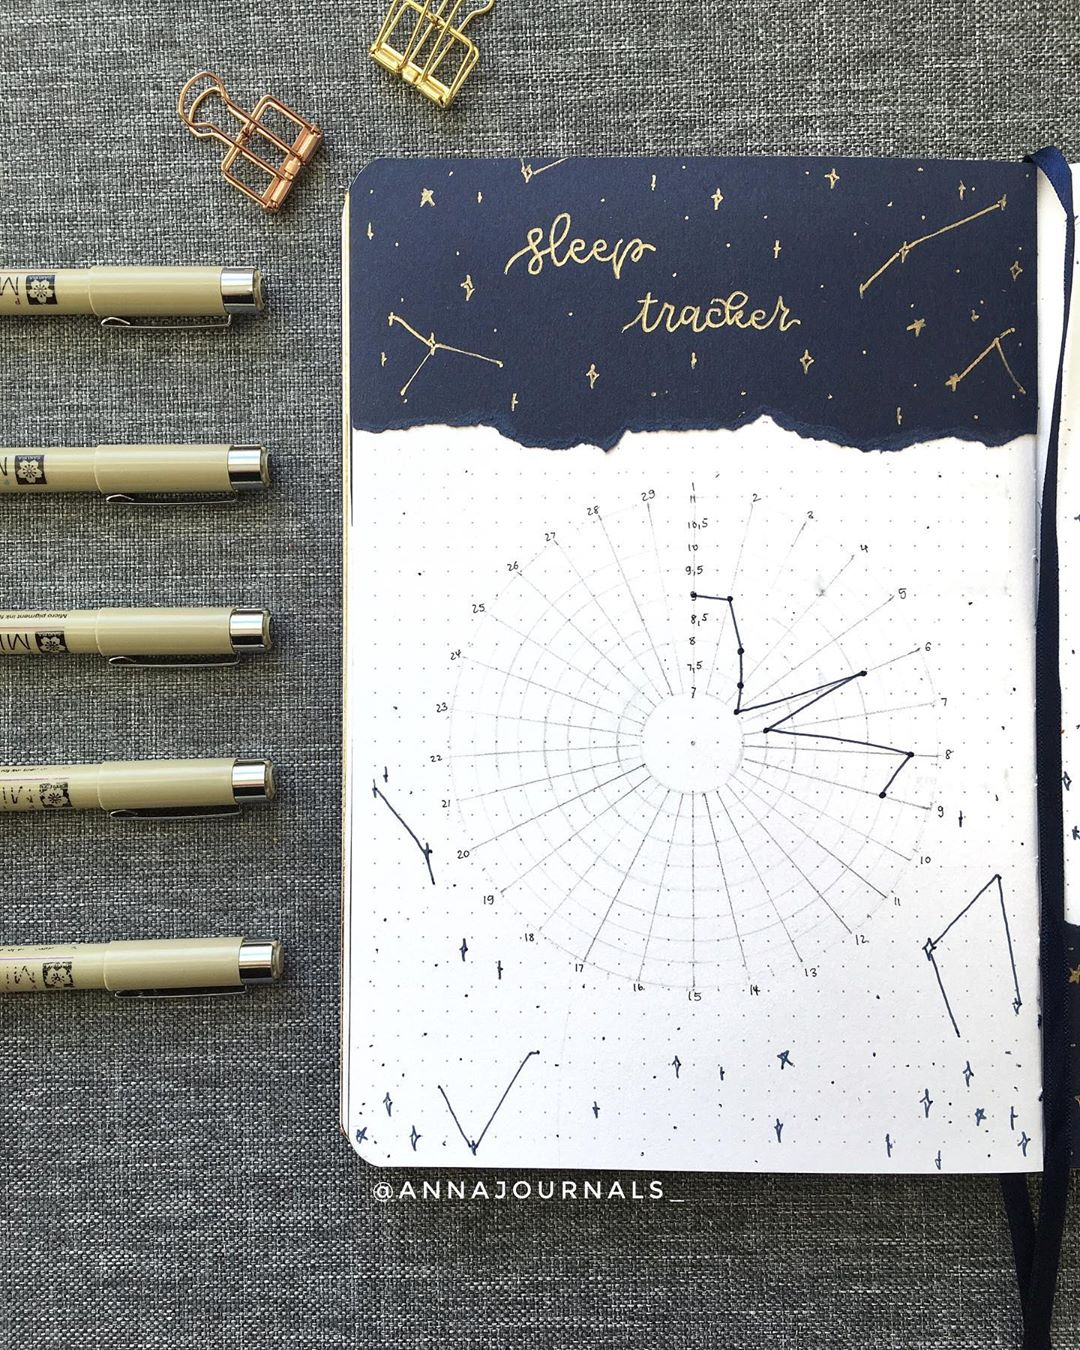 Bullet Journal Sleep Tracker Ideas, Bujo Sleep Trackers, Bullet Journal Sleep Spreads